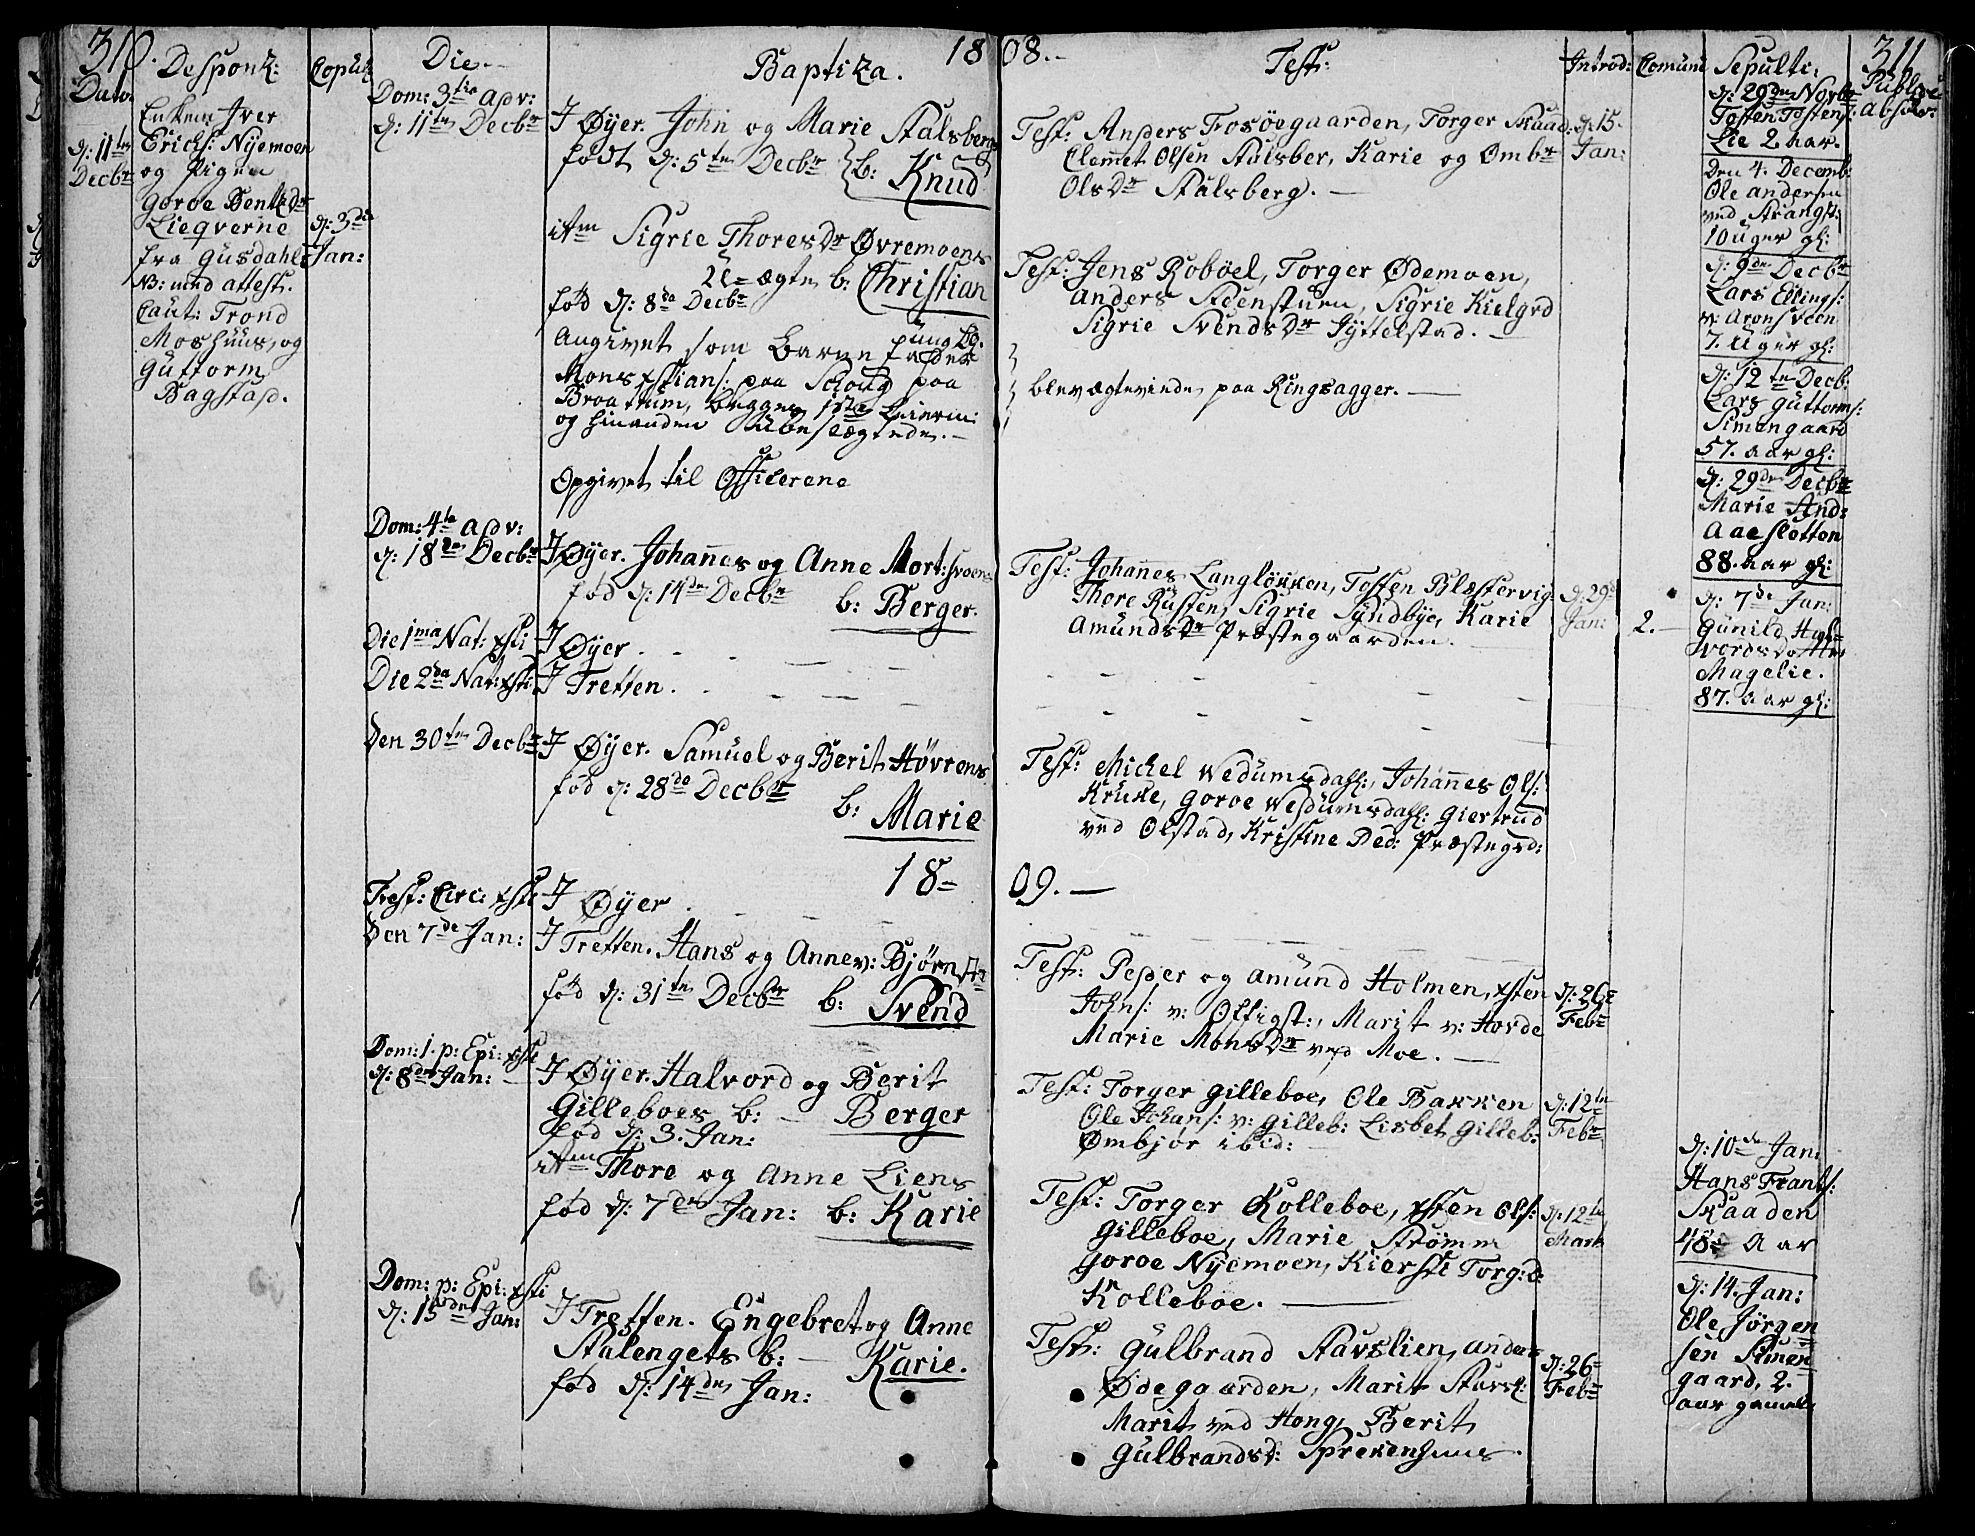 SAH, Øyer prestekontor, Ministerialbok nr. 3, 1784-1824, s. 310-311